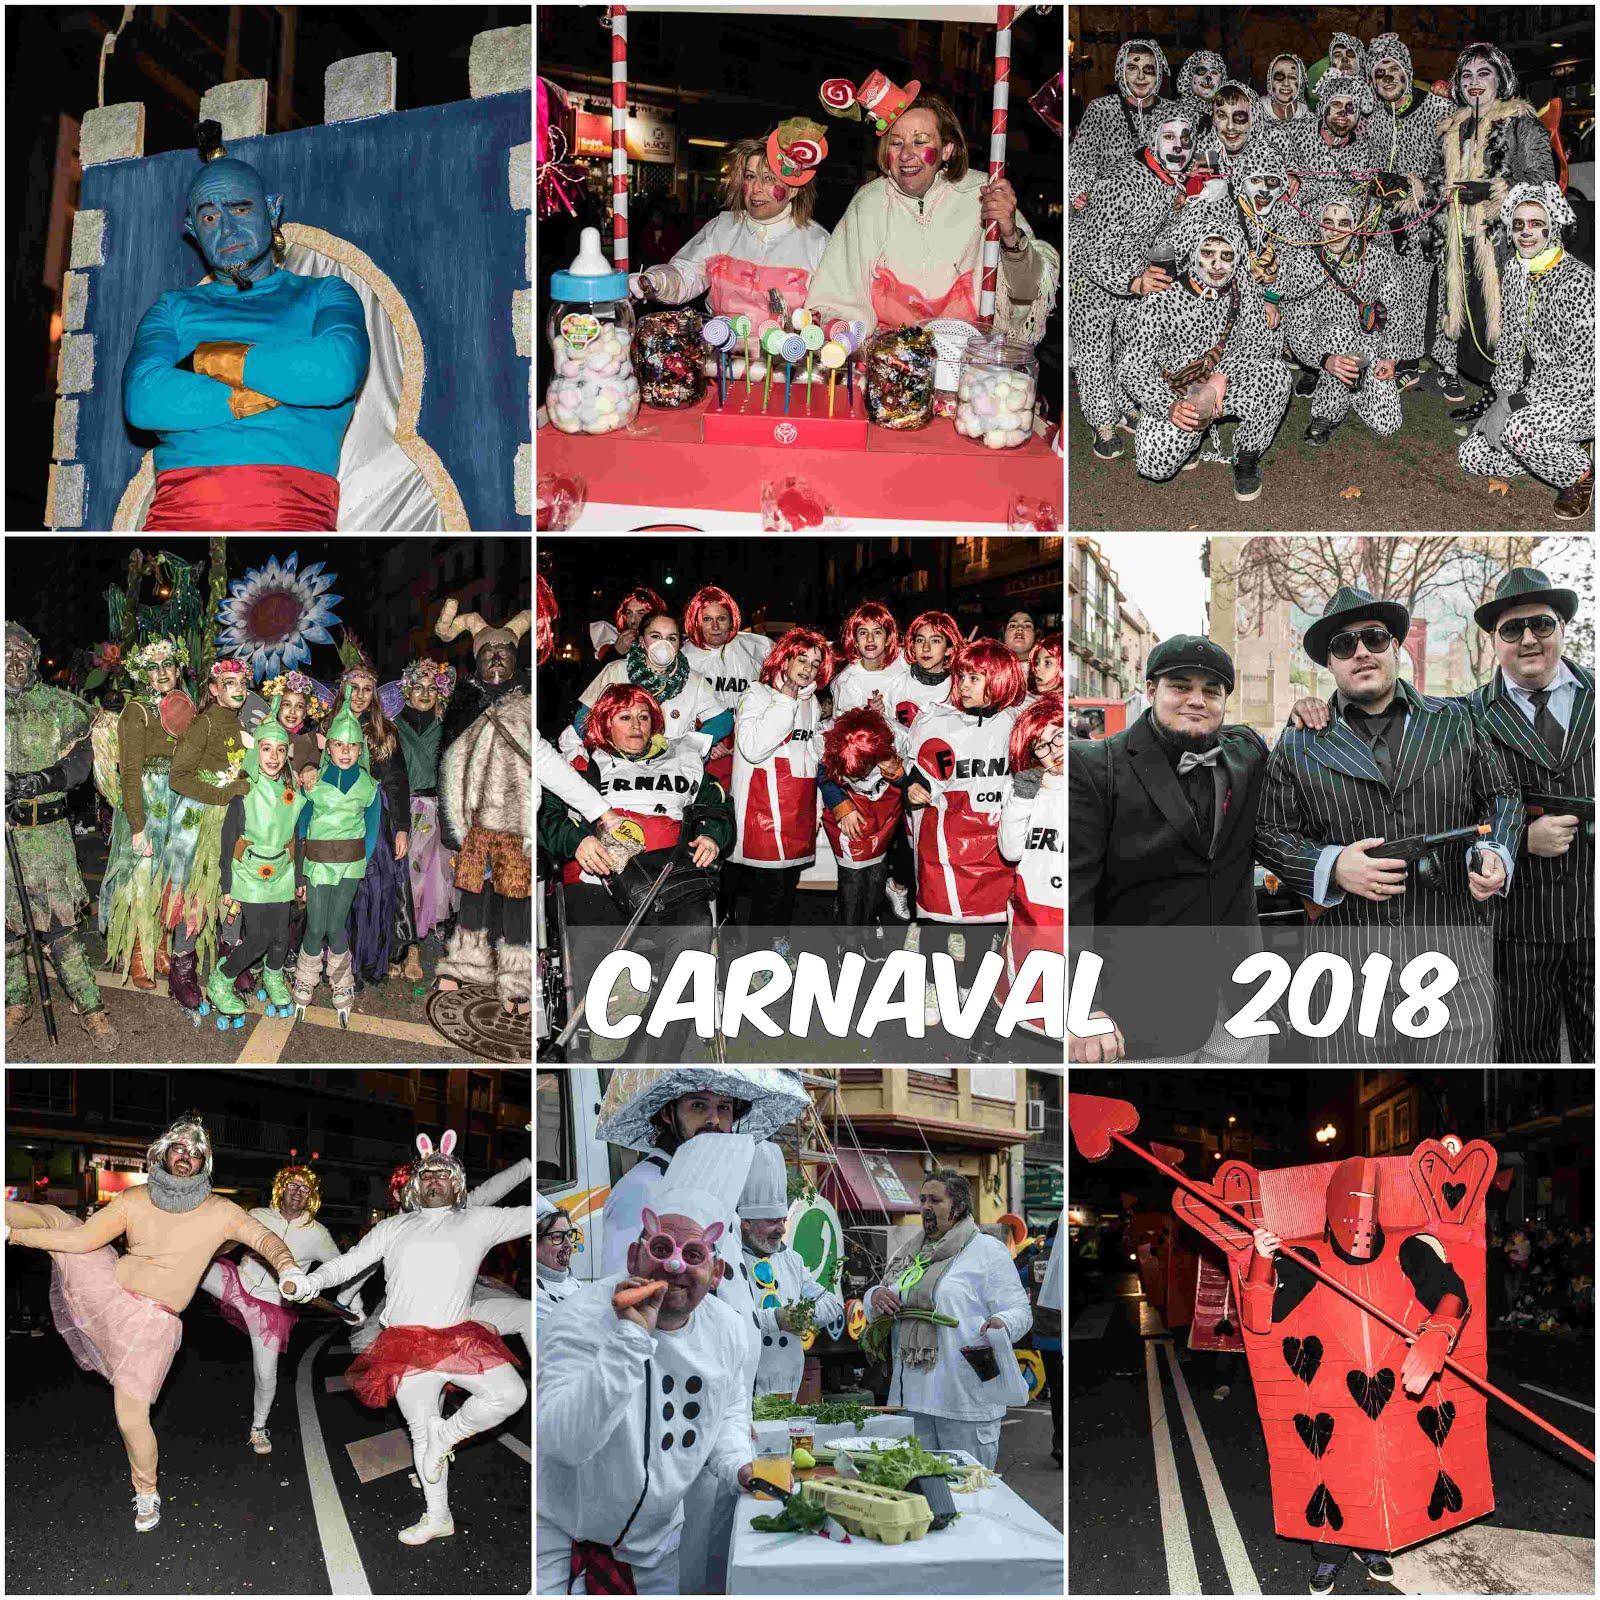 Carnaval .  2018